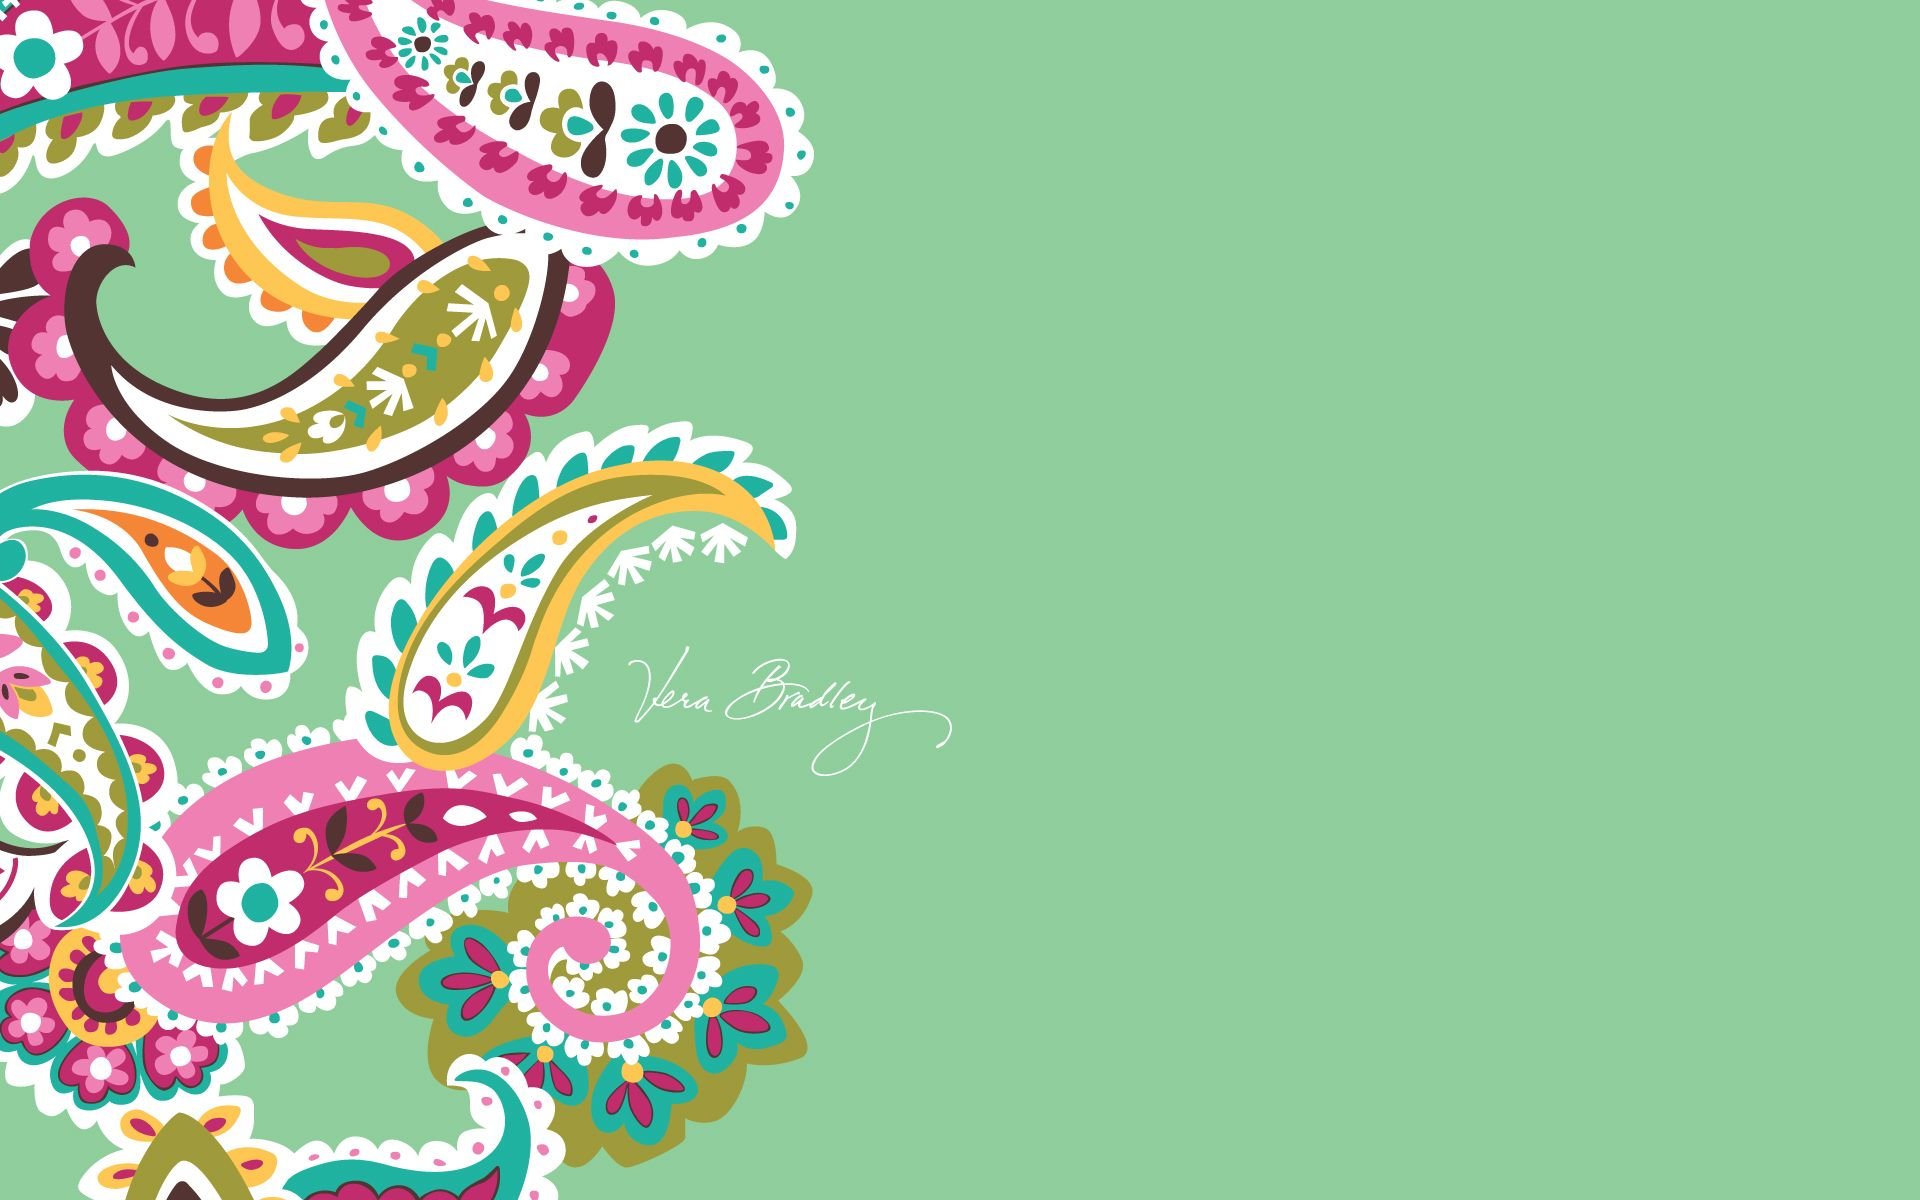 vera bradley patterns backgrounds | Vera Bradley Summer 2013 New ...